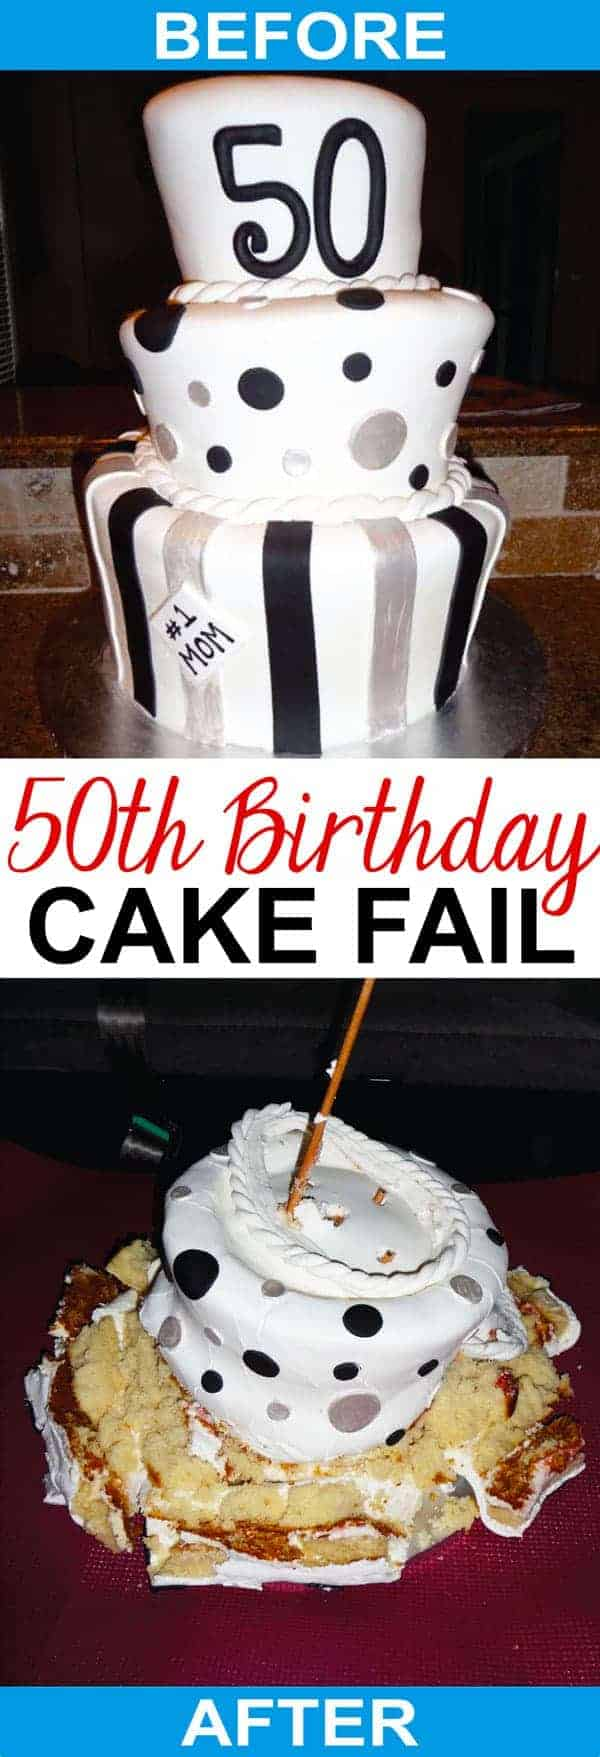 50th Birthday Cake Fail